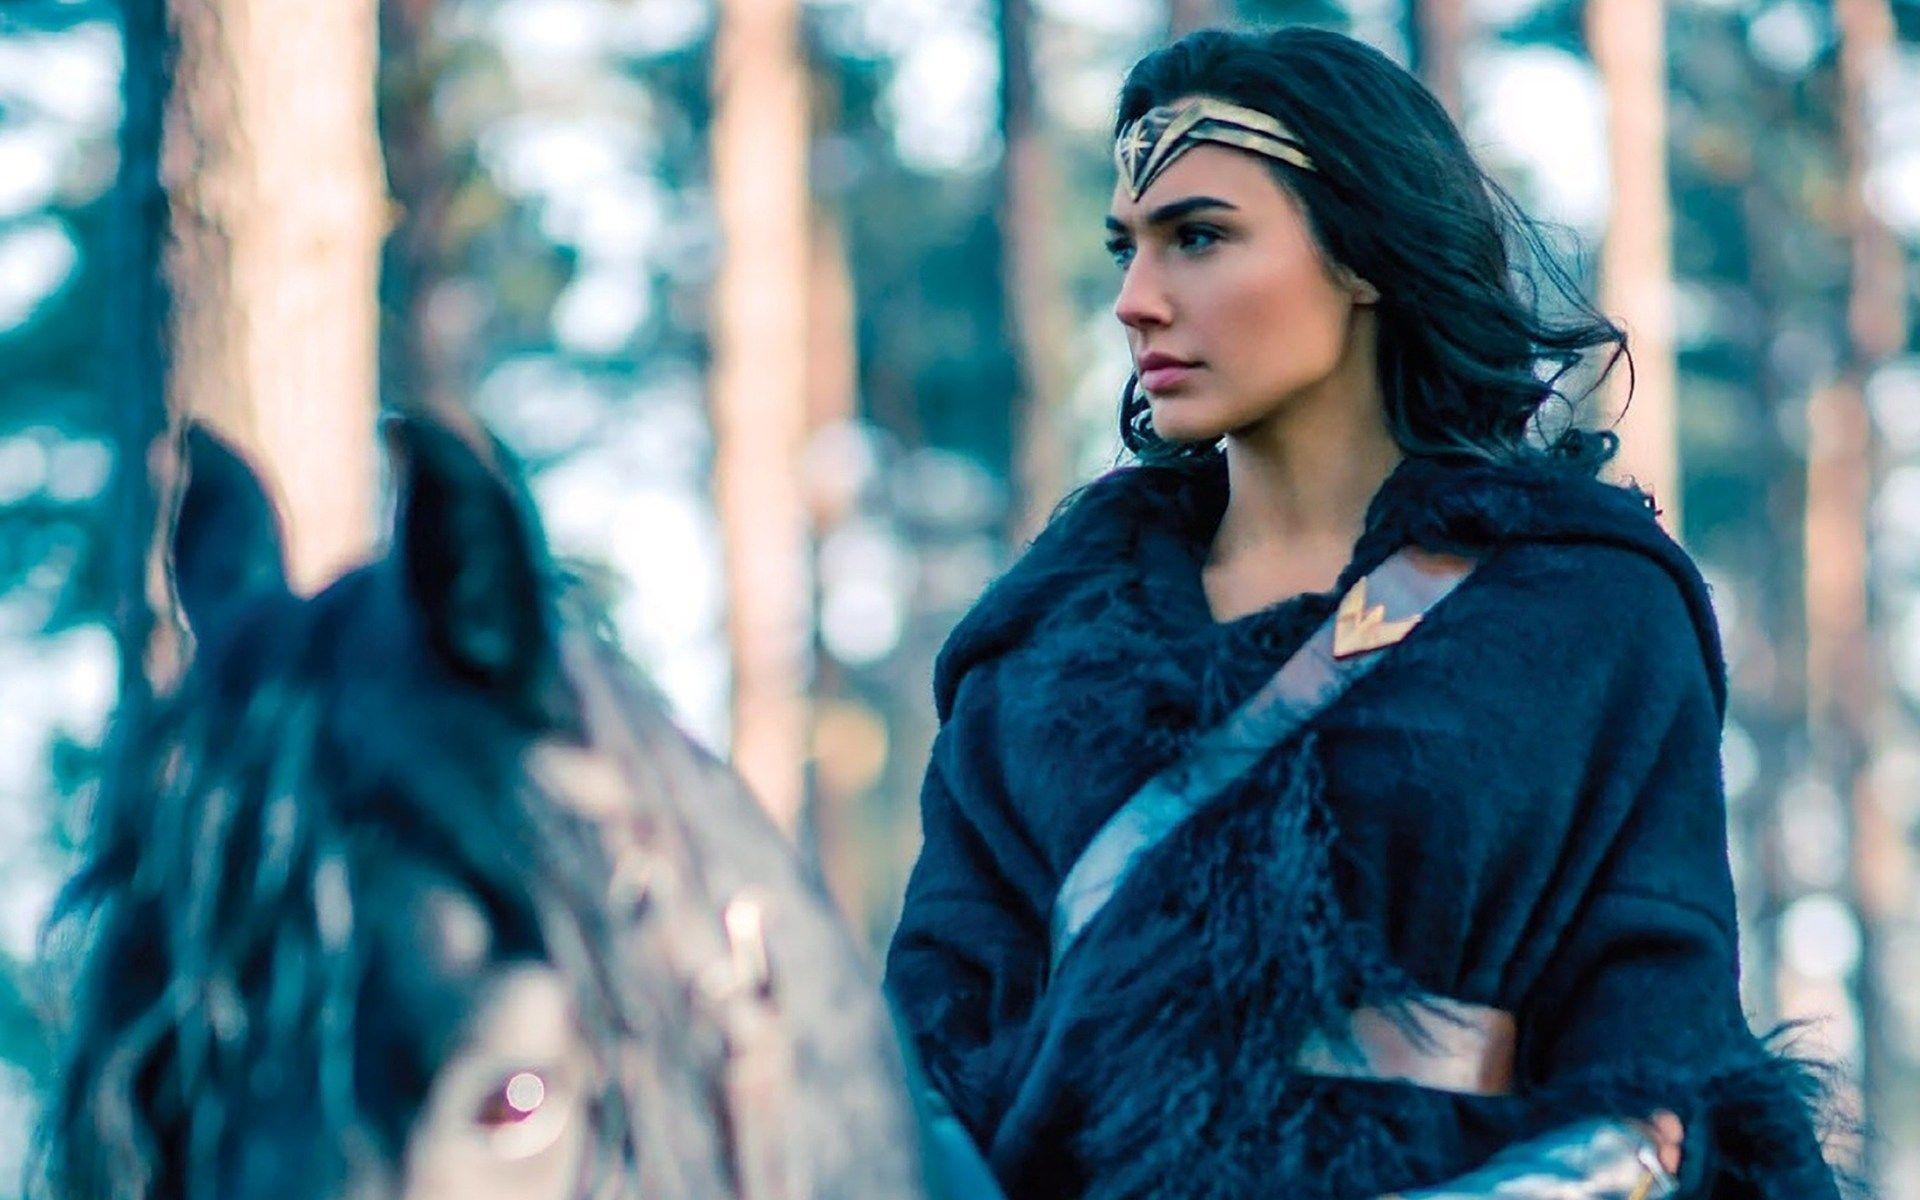 Gal Gadot As Diana Prince In Wonder Woman Wallpapers – .